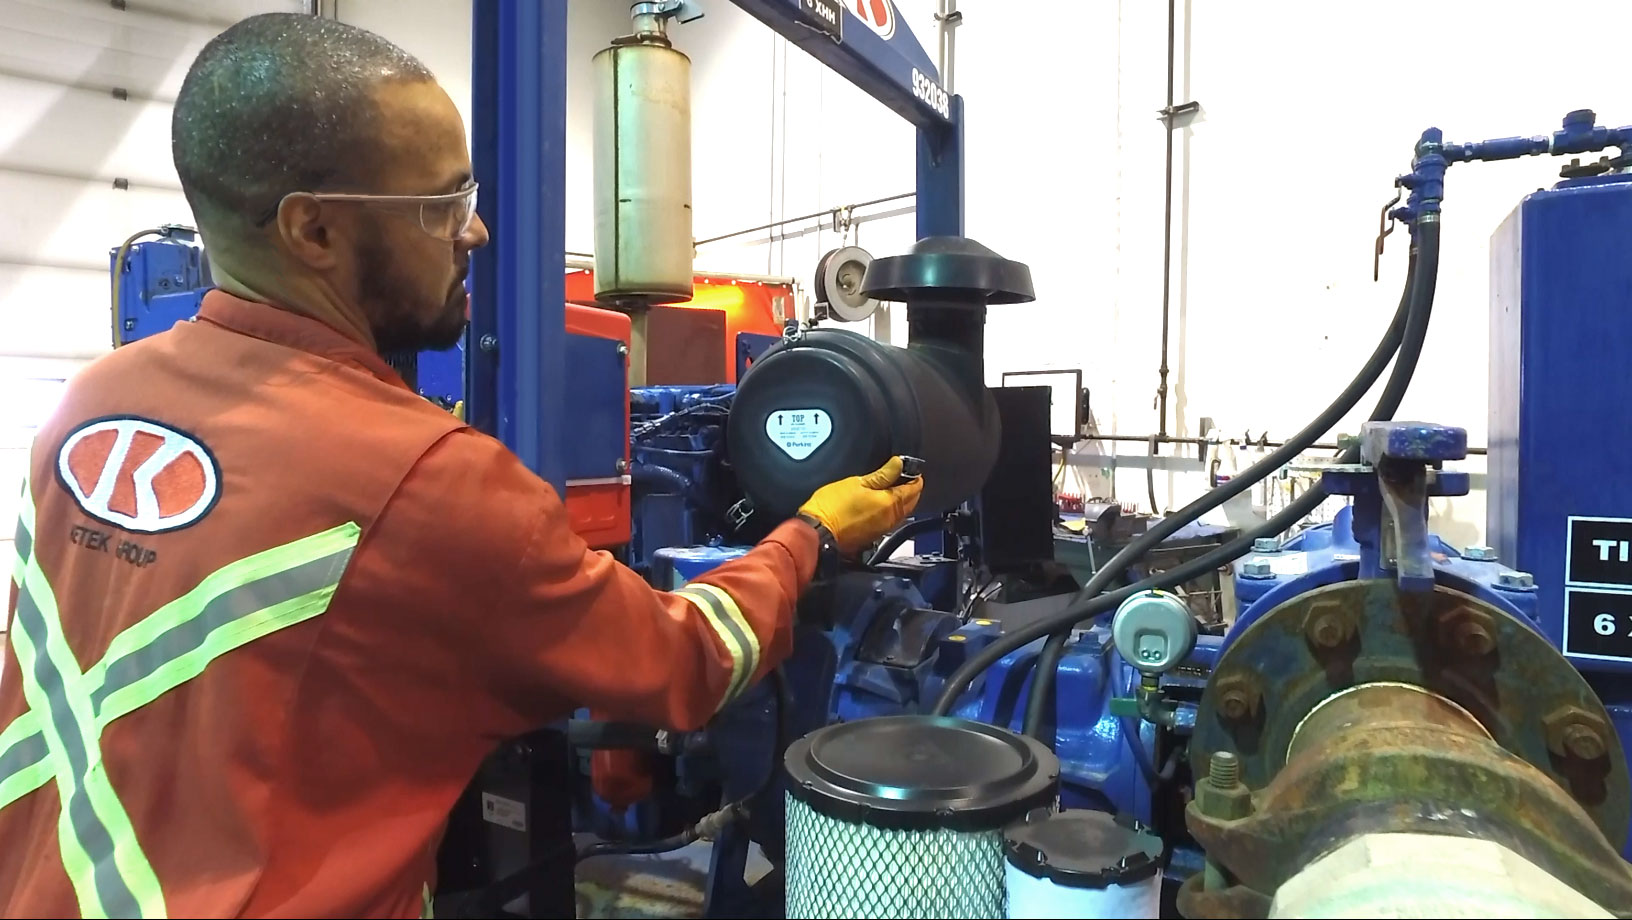 Equipment-Maintenance-Services-Edmonton-Alberta